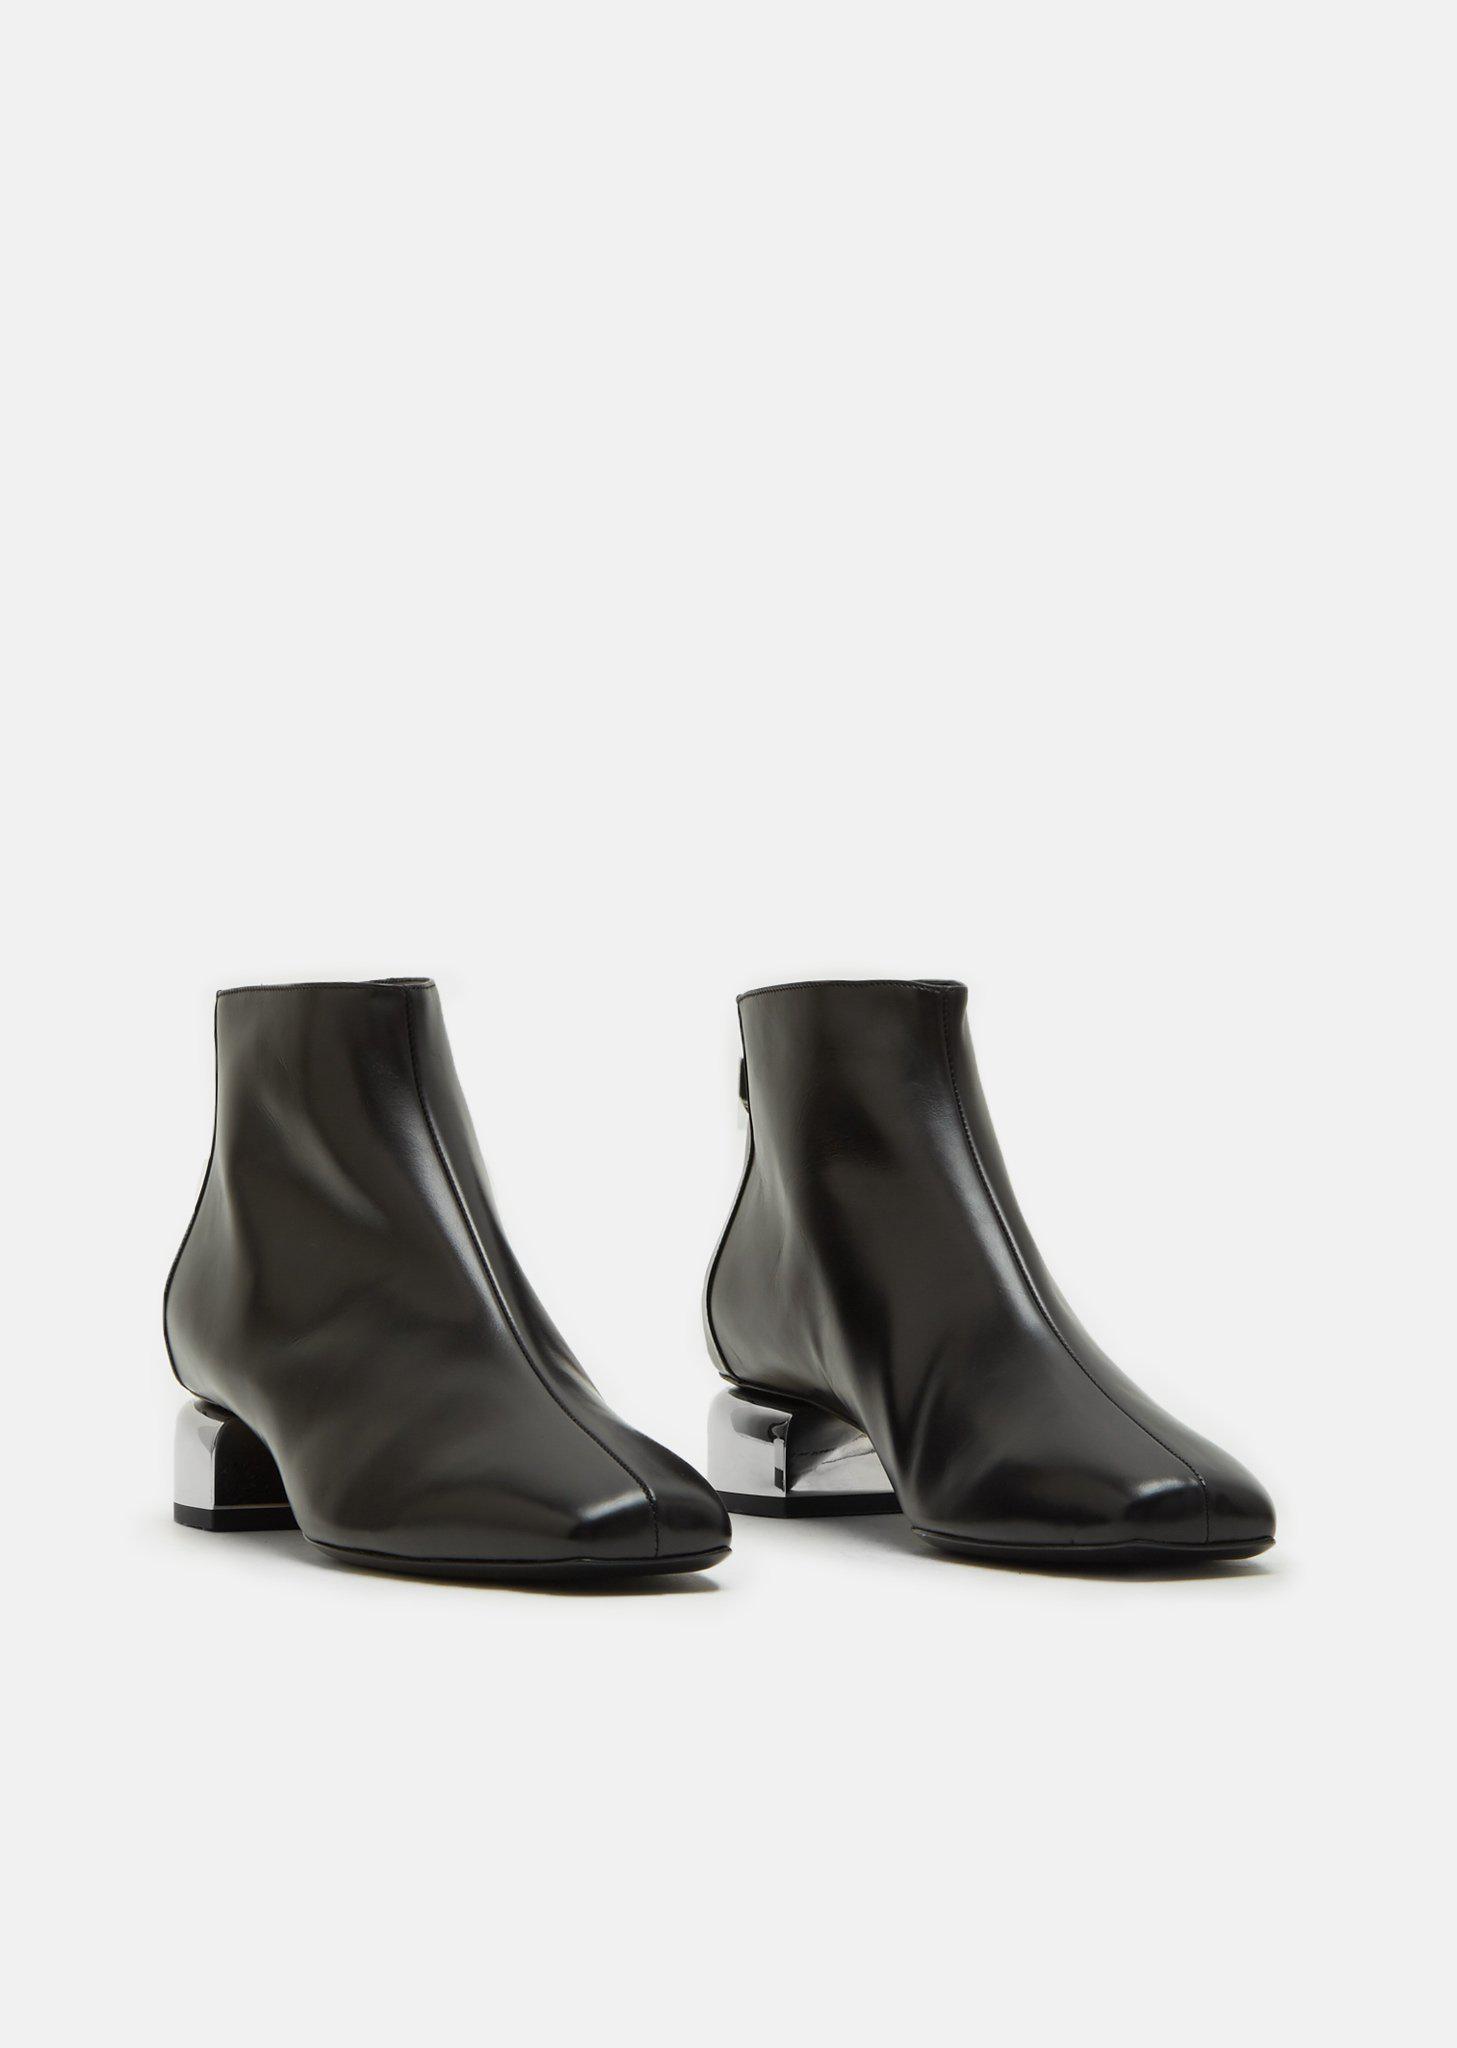 Pierre Hardy Laura heeled ankle boots IBN1JiZKie